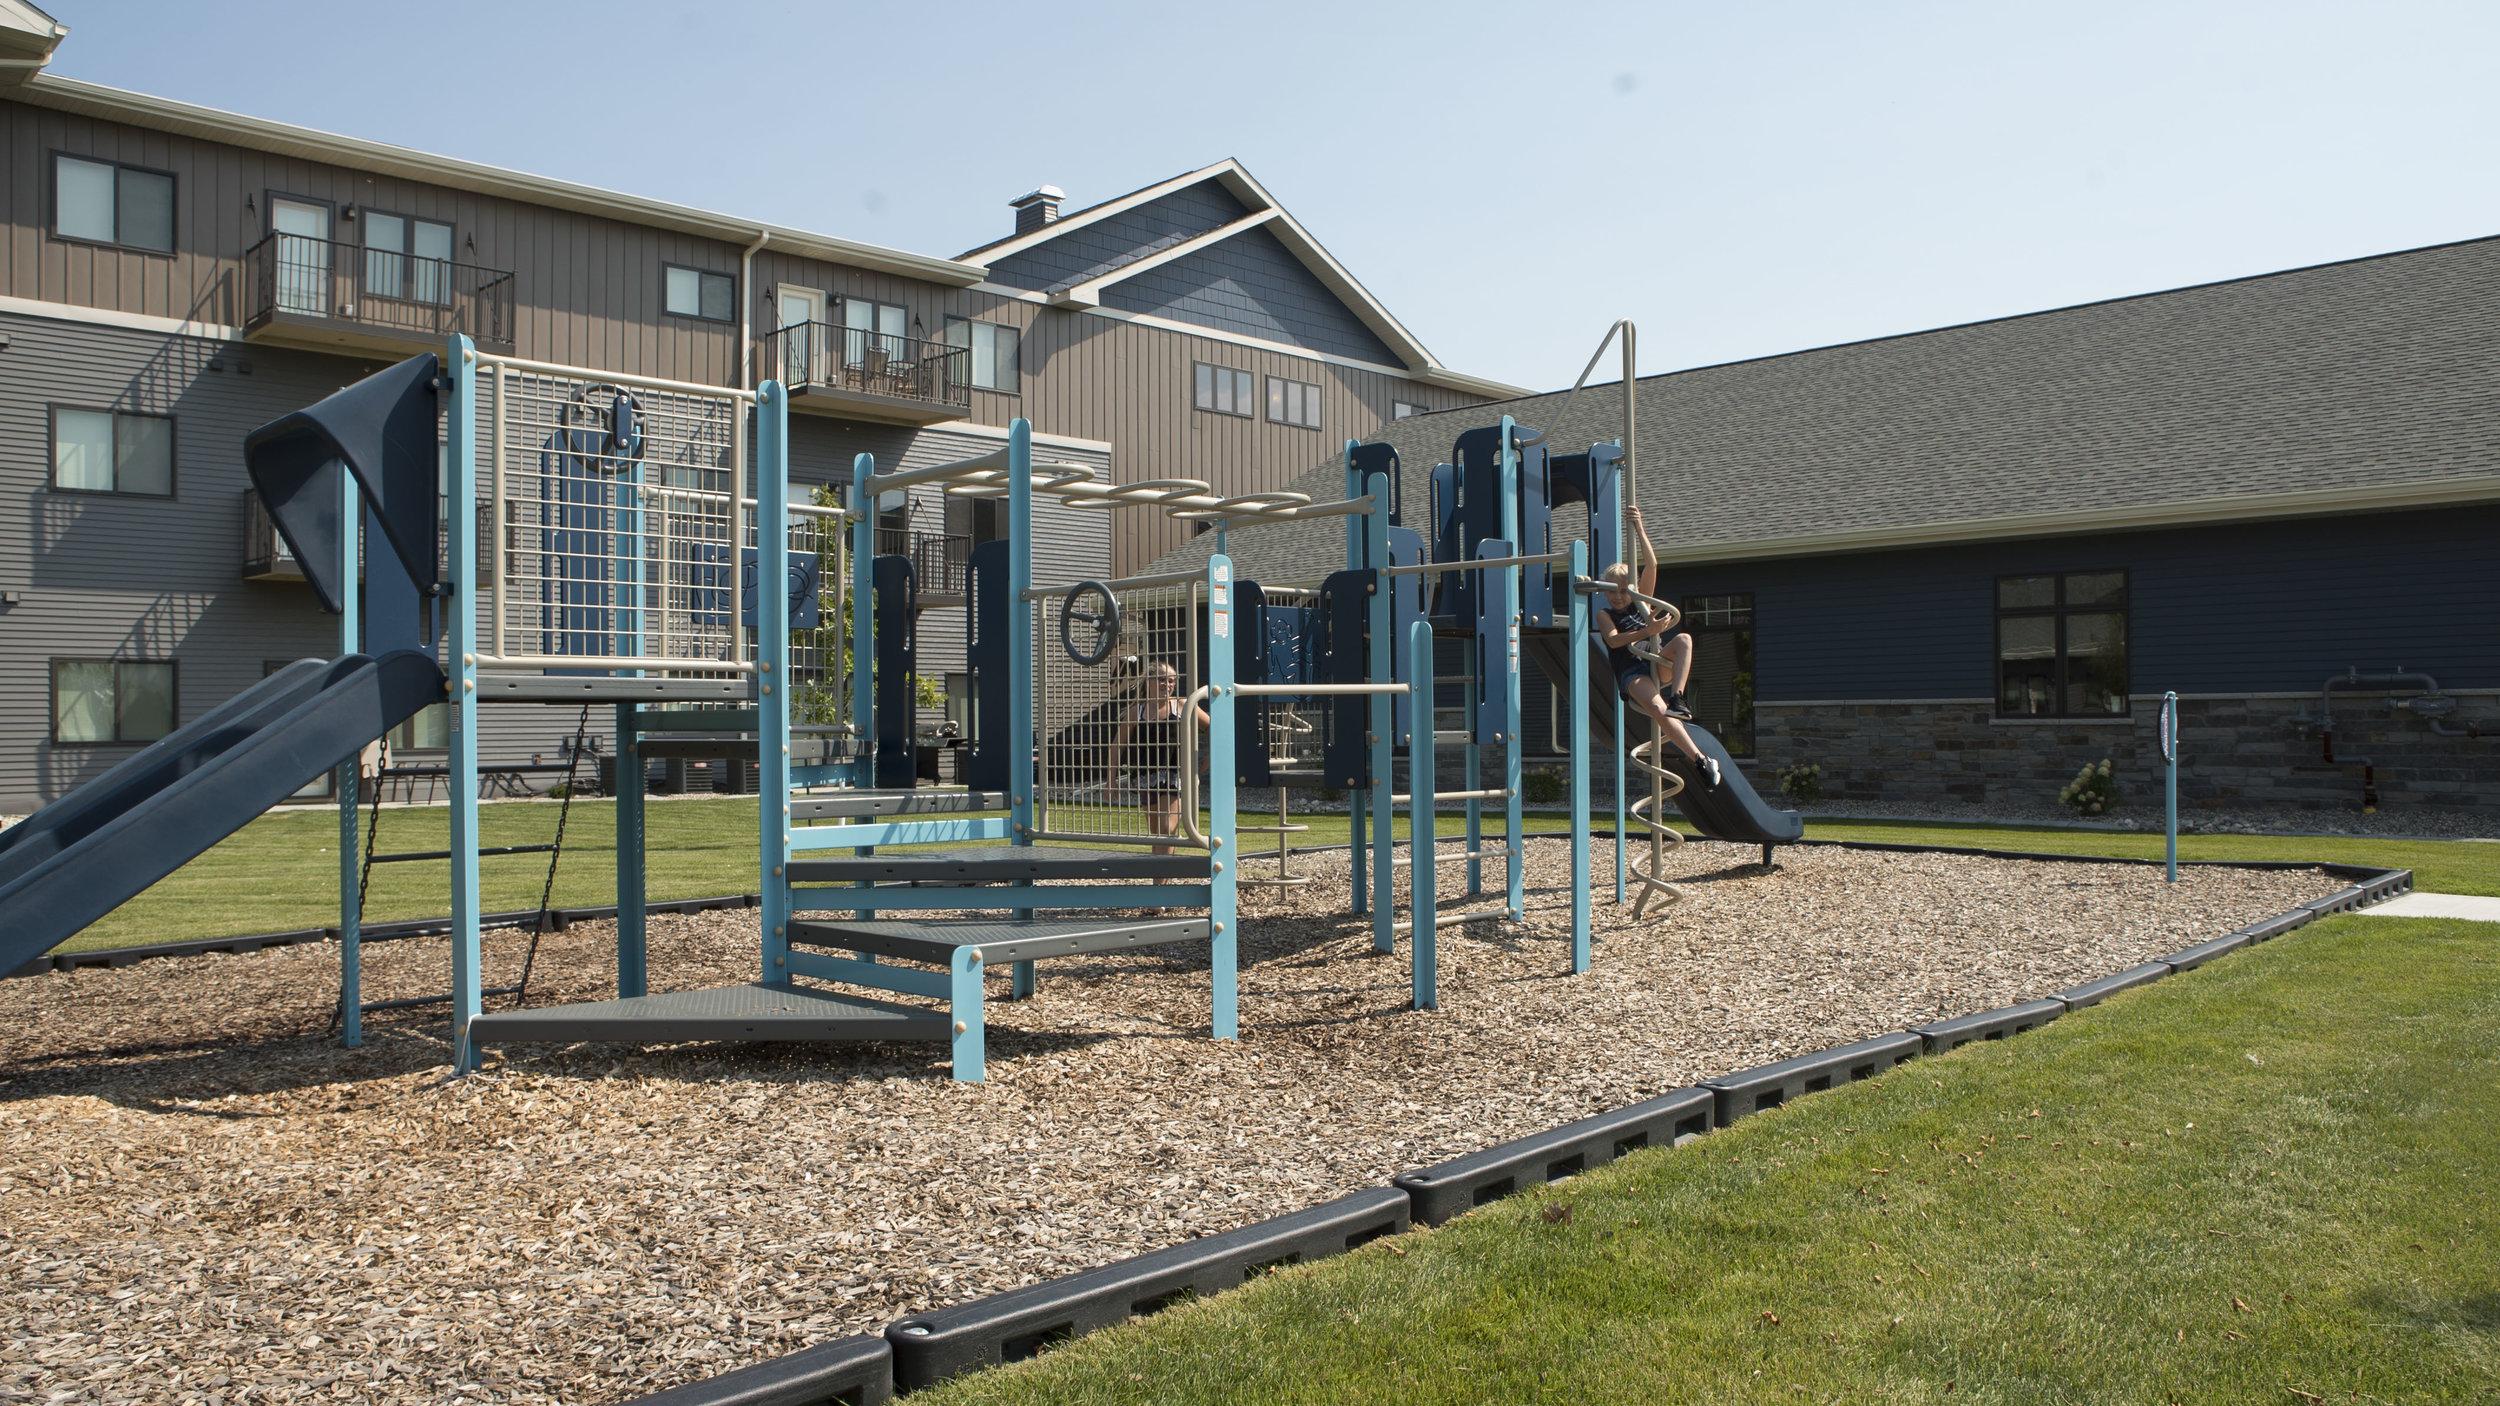 13-Community Playground for Fun in the Sun.jpg